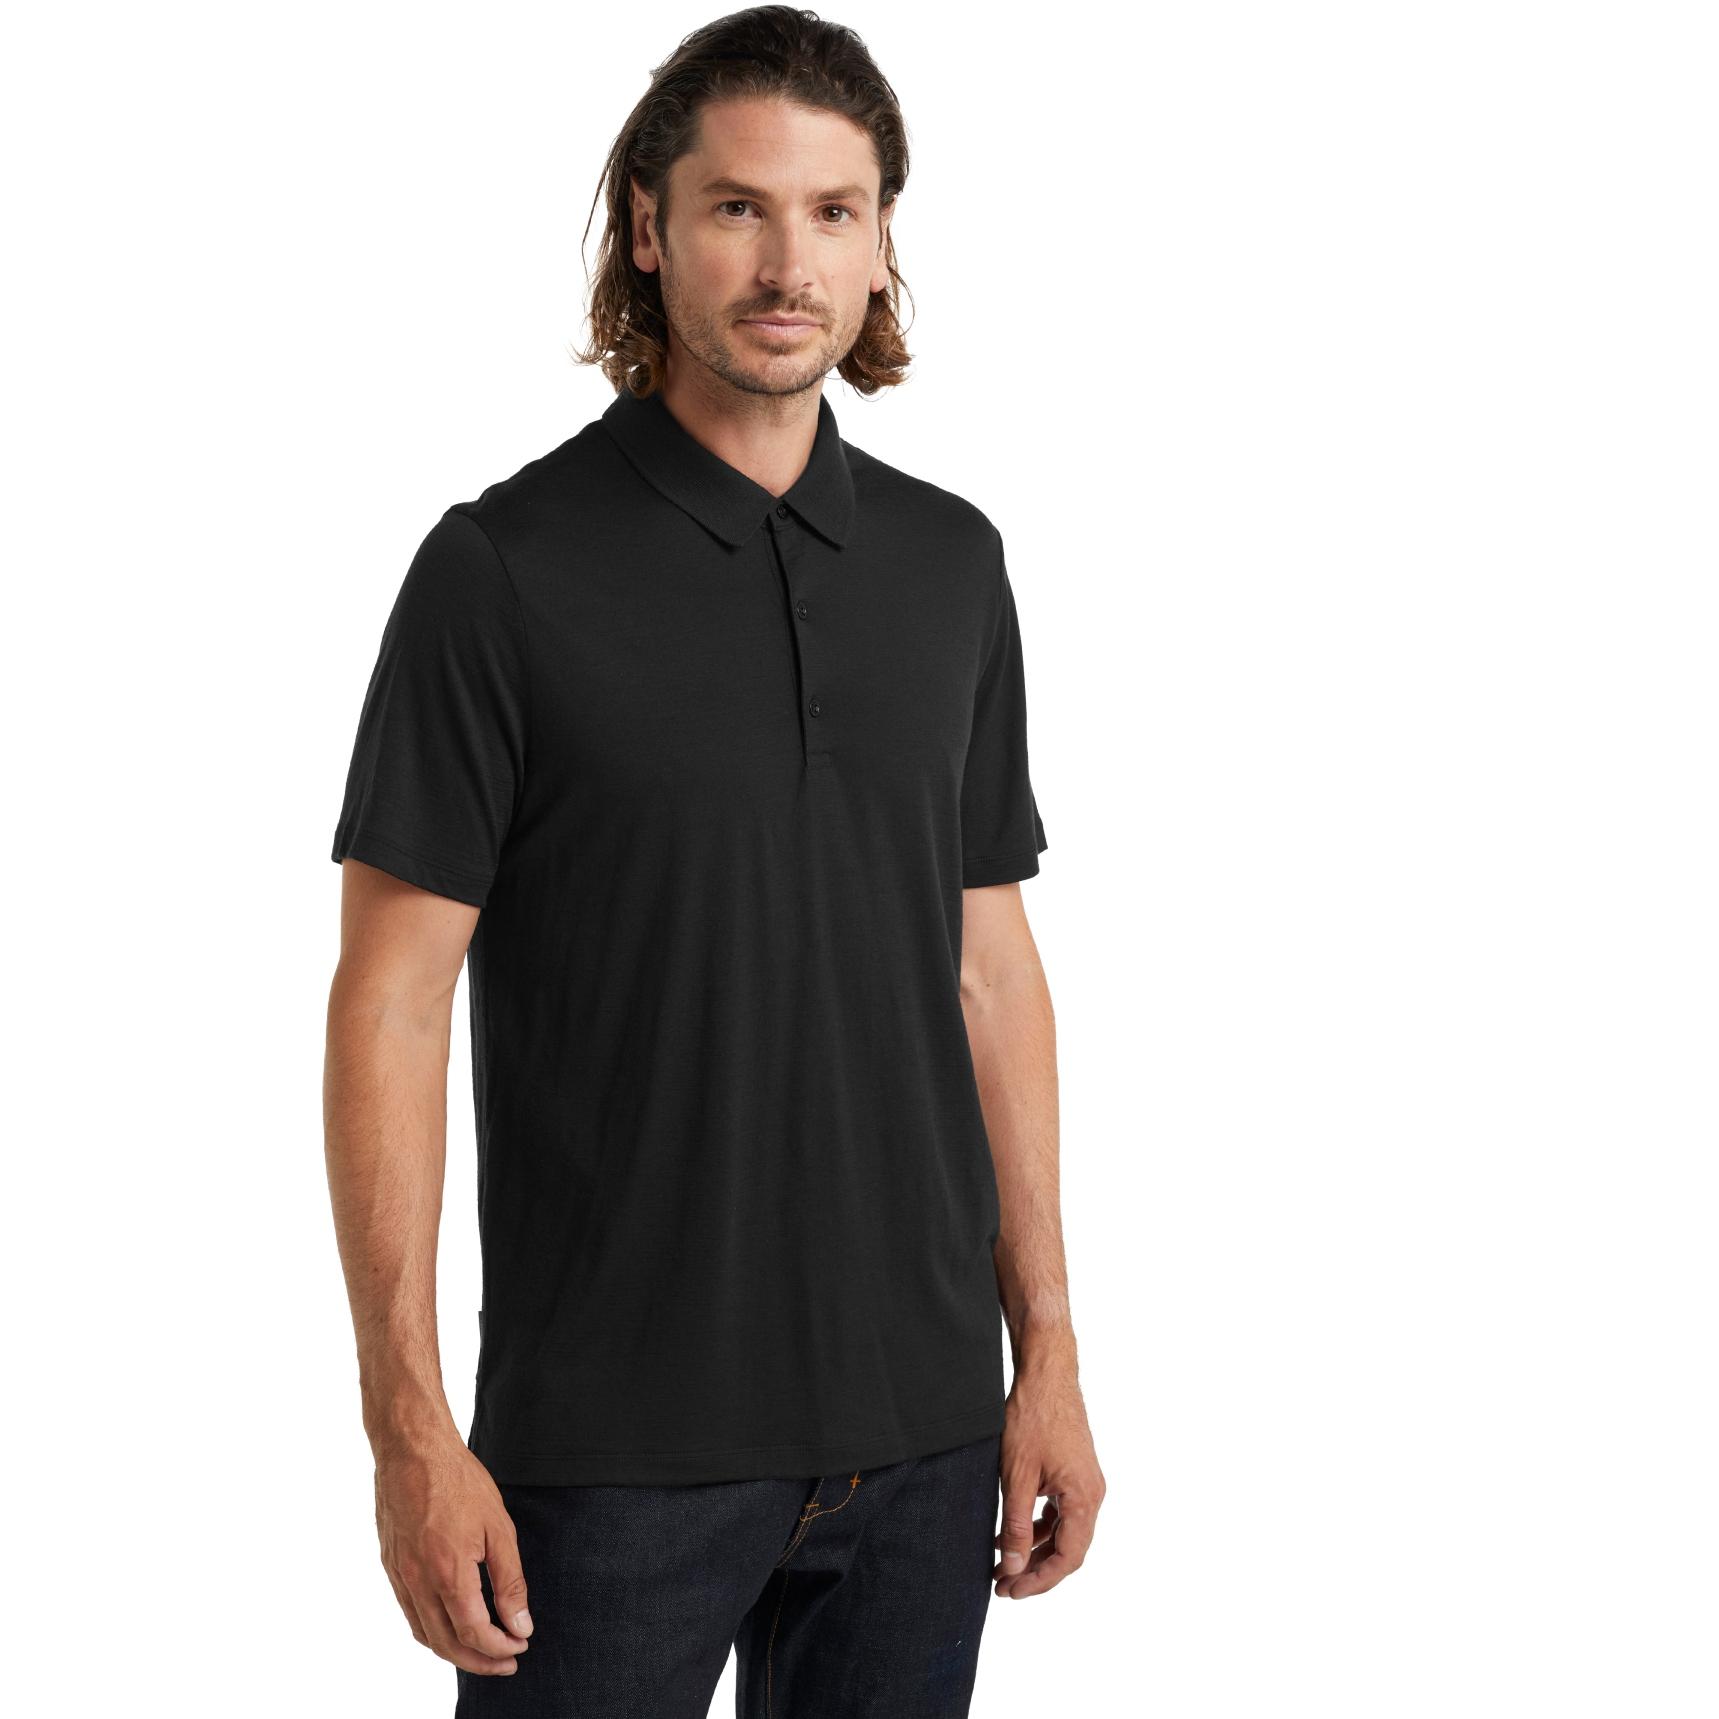 Bild von Icebreaker Tech Lite II Herren Polo-Shirt - Black